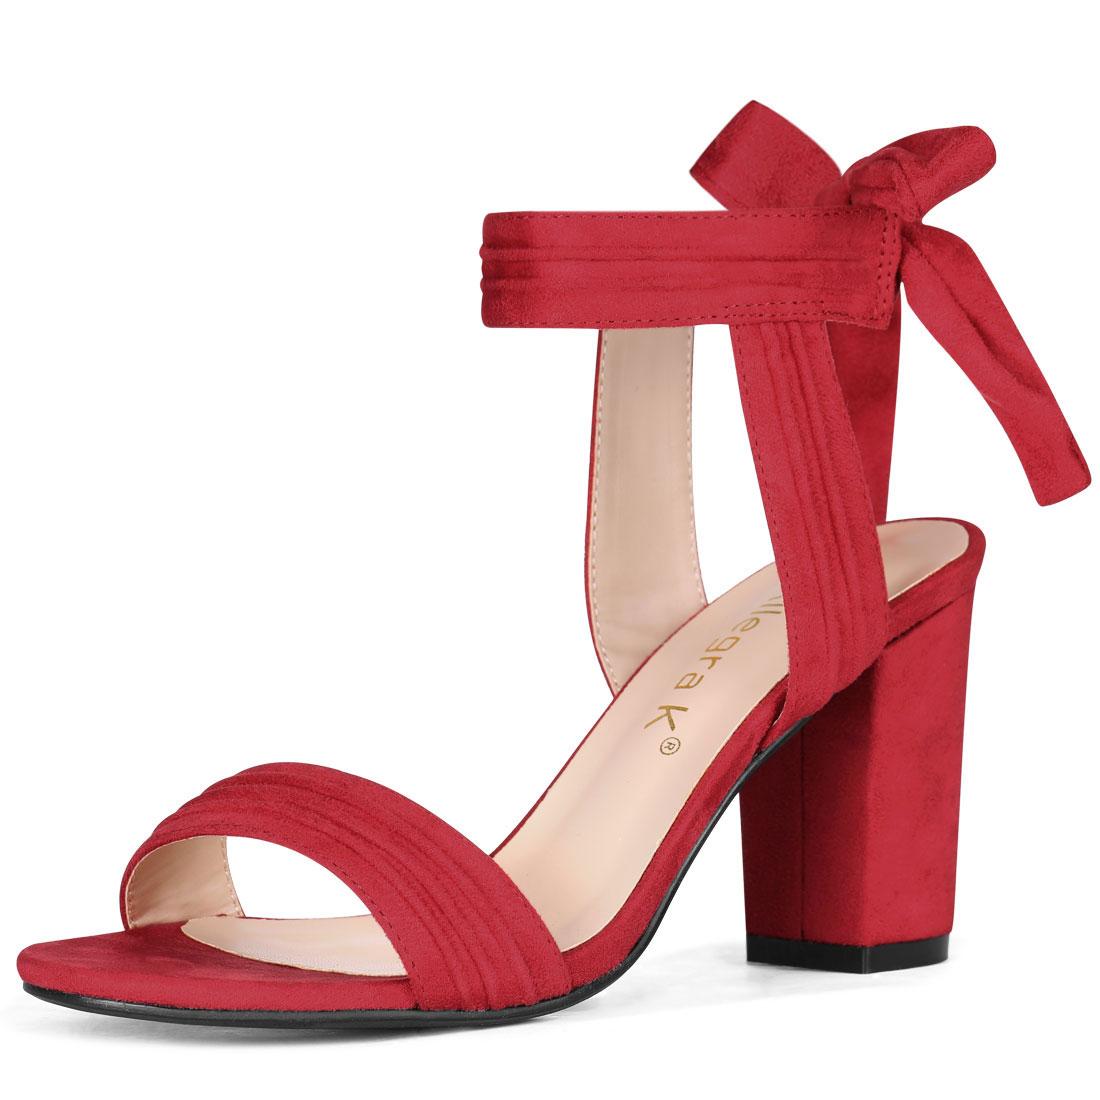 Allegra K Women's Open Toe Ankle Tie Back Chunky Heel Sandals Red US 10.5